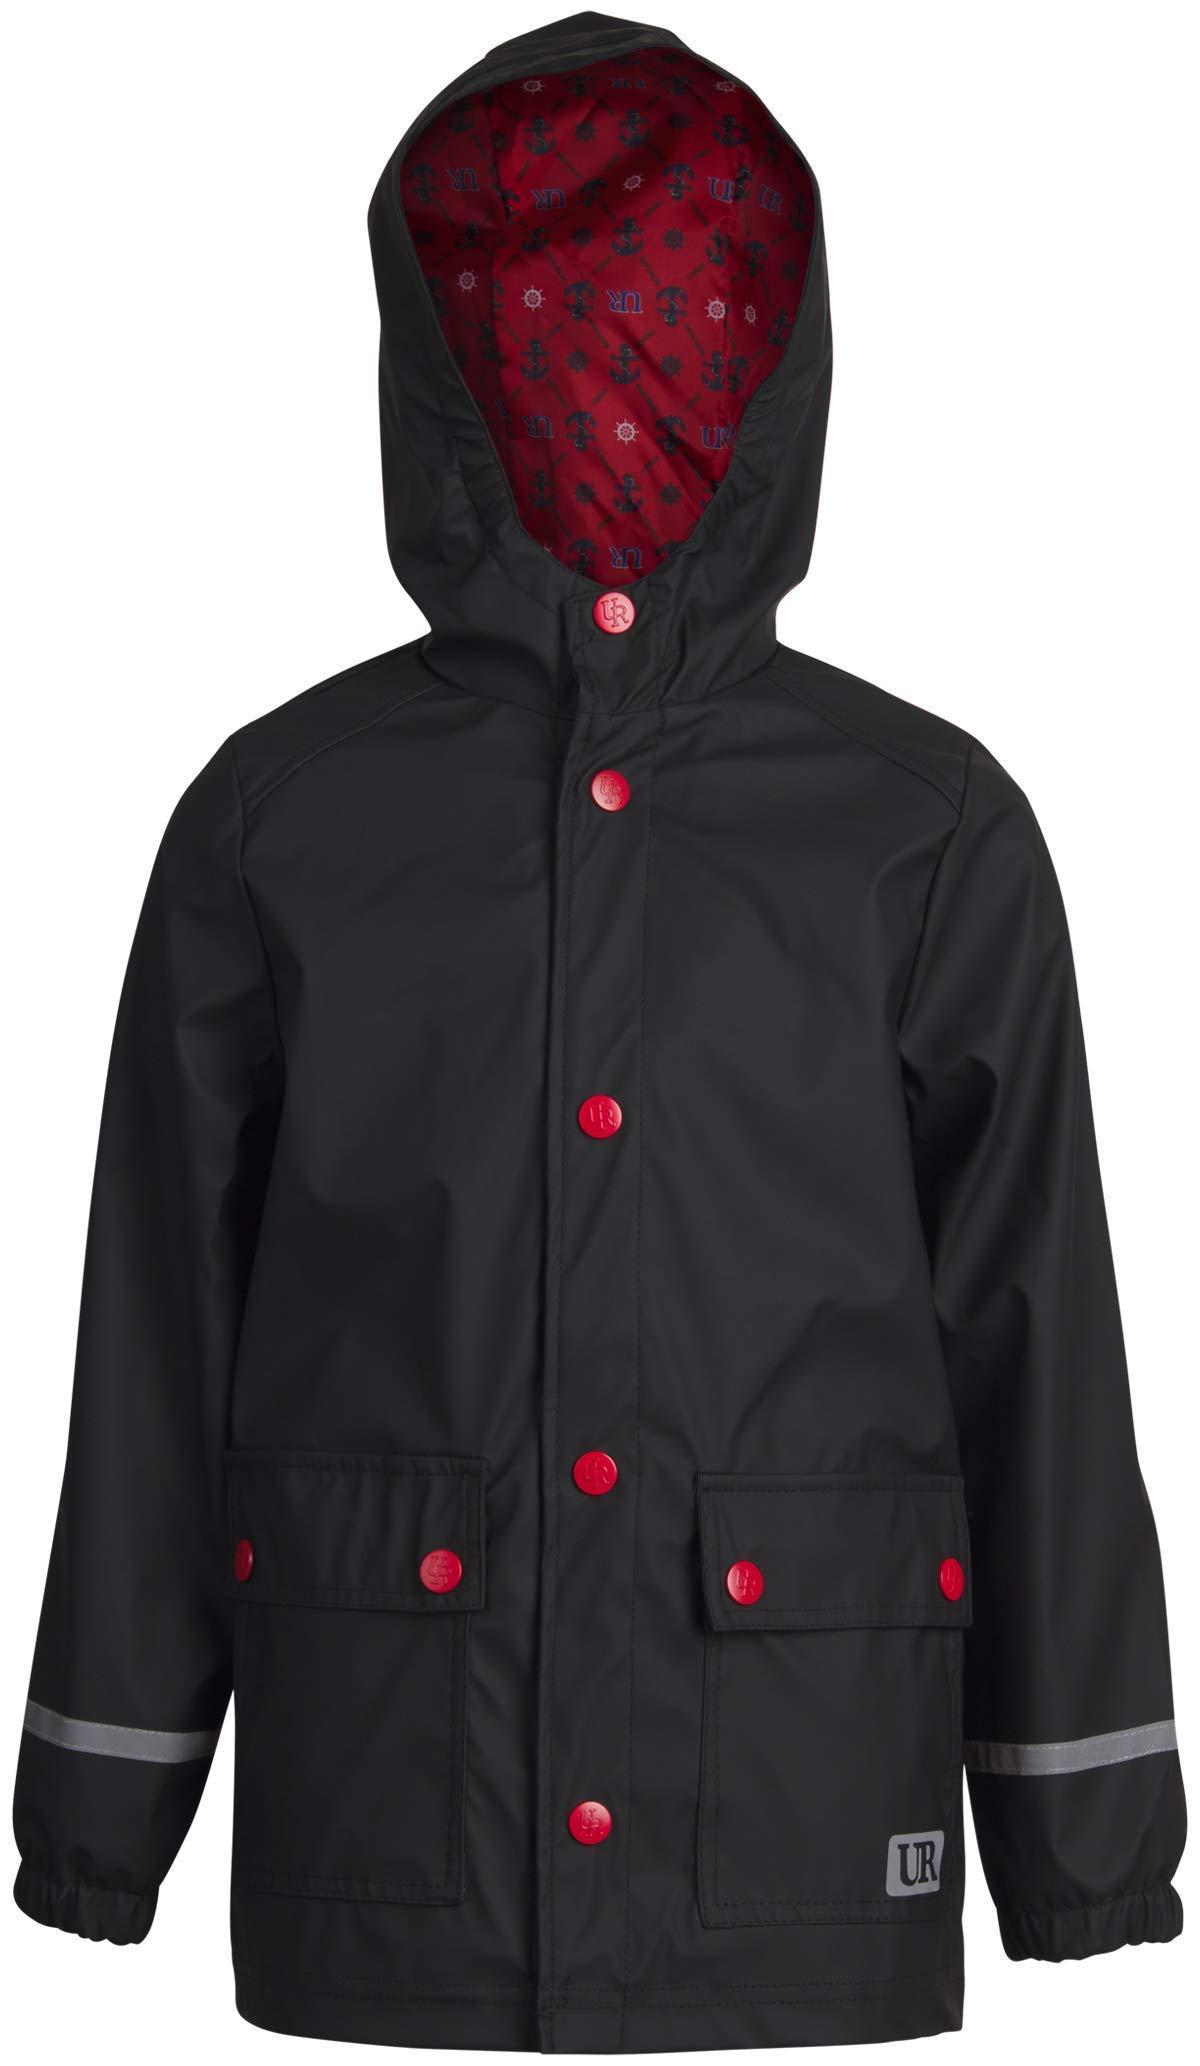 Urban Republic Boys' Waterproof Vinyl Hooded Rain Jacket with Reflective Taping, Size 8, Black' by Urban Republic